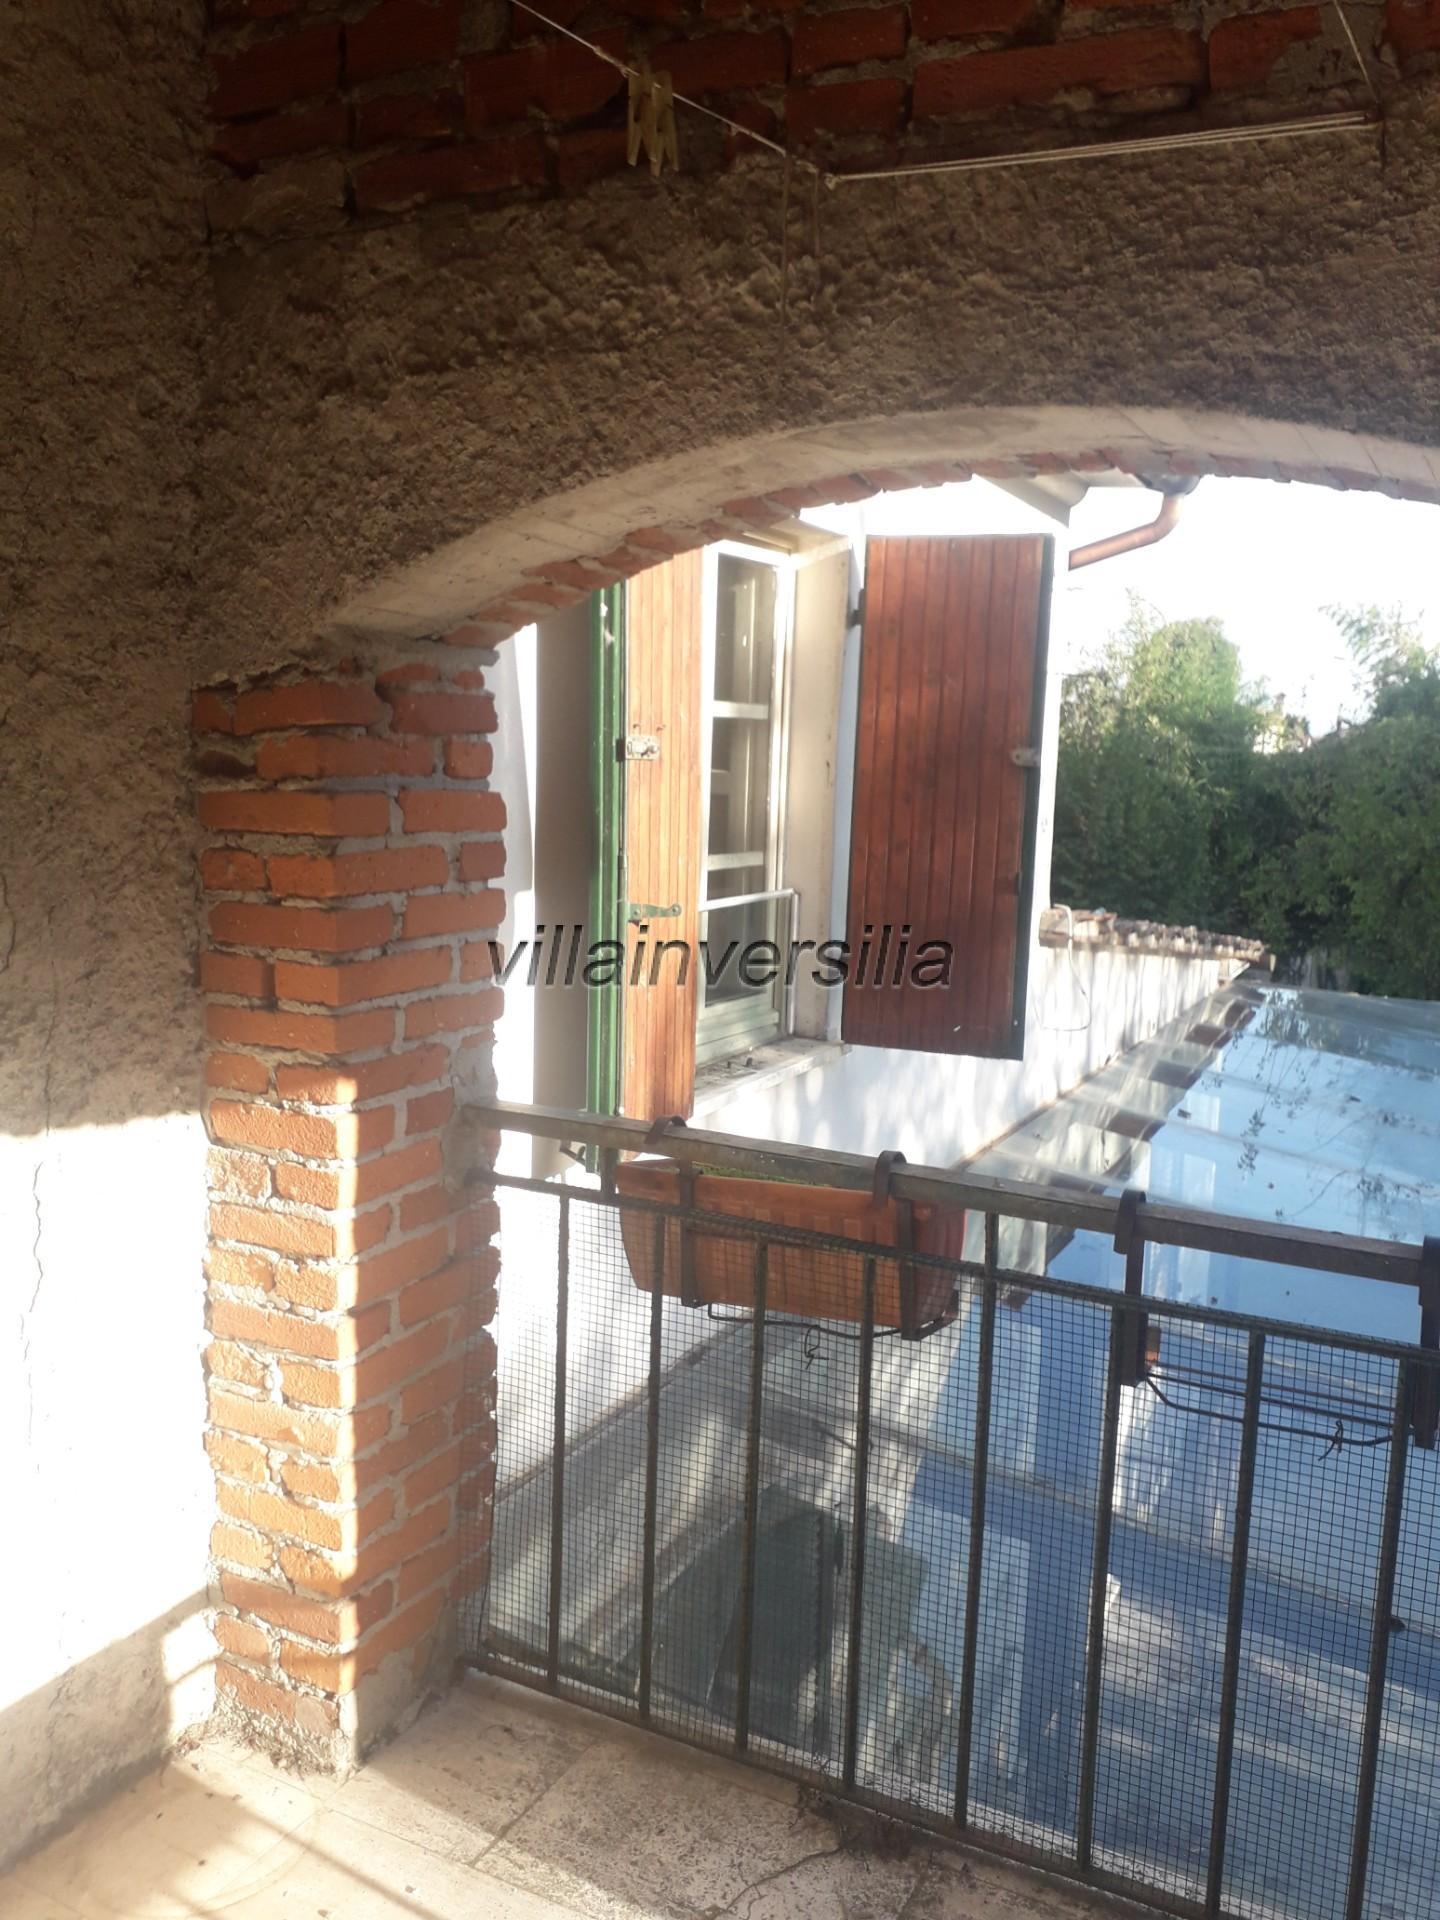 Photo 28/37 for ref. V 4217 casale Toscano